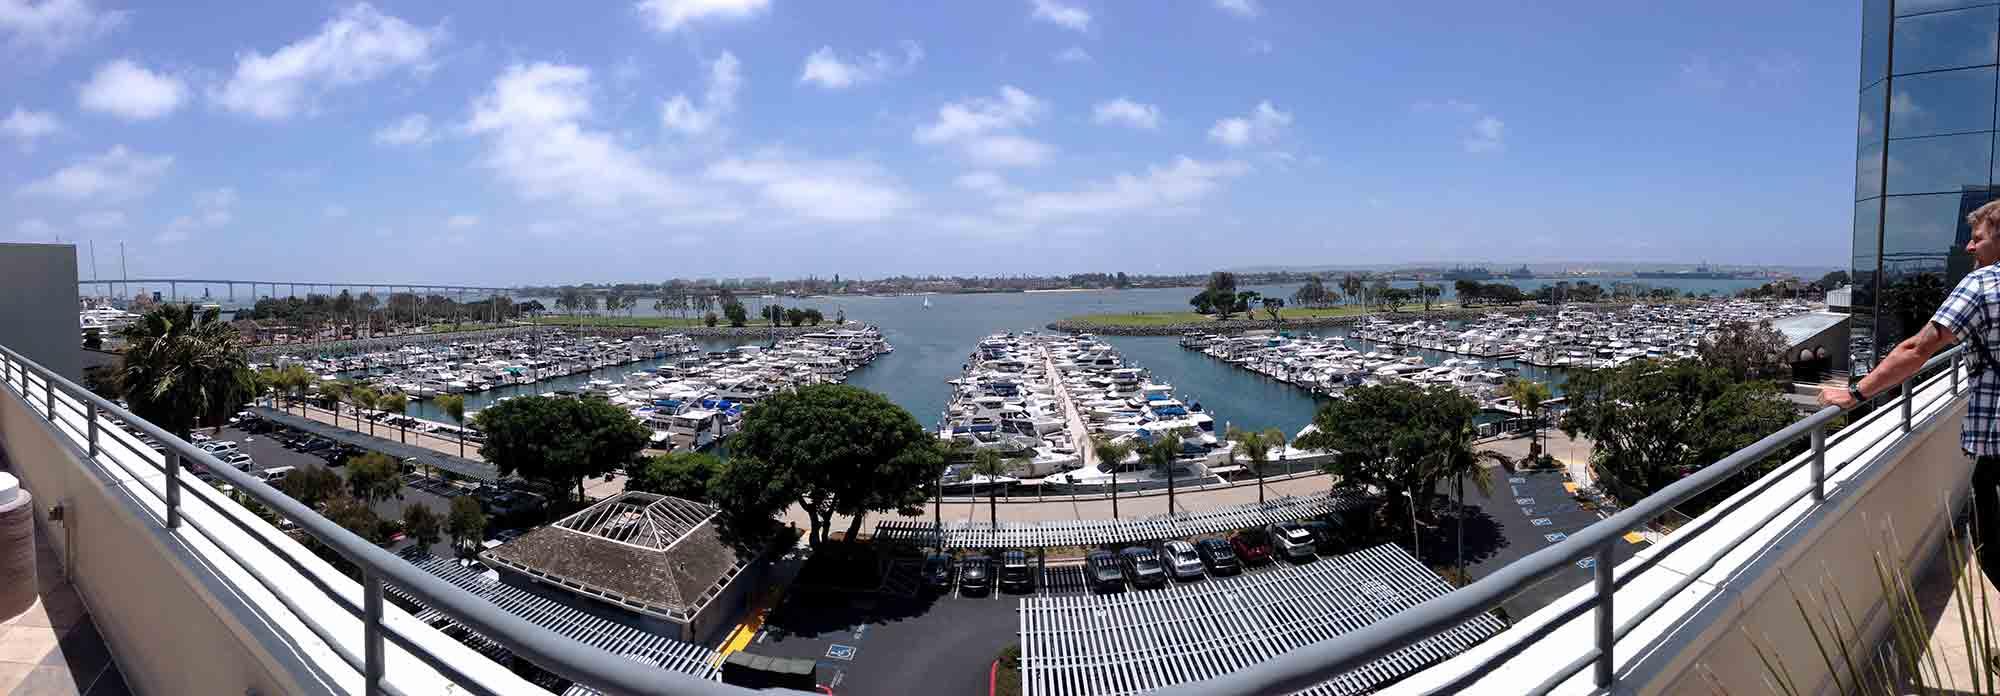 AEA San Diego